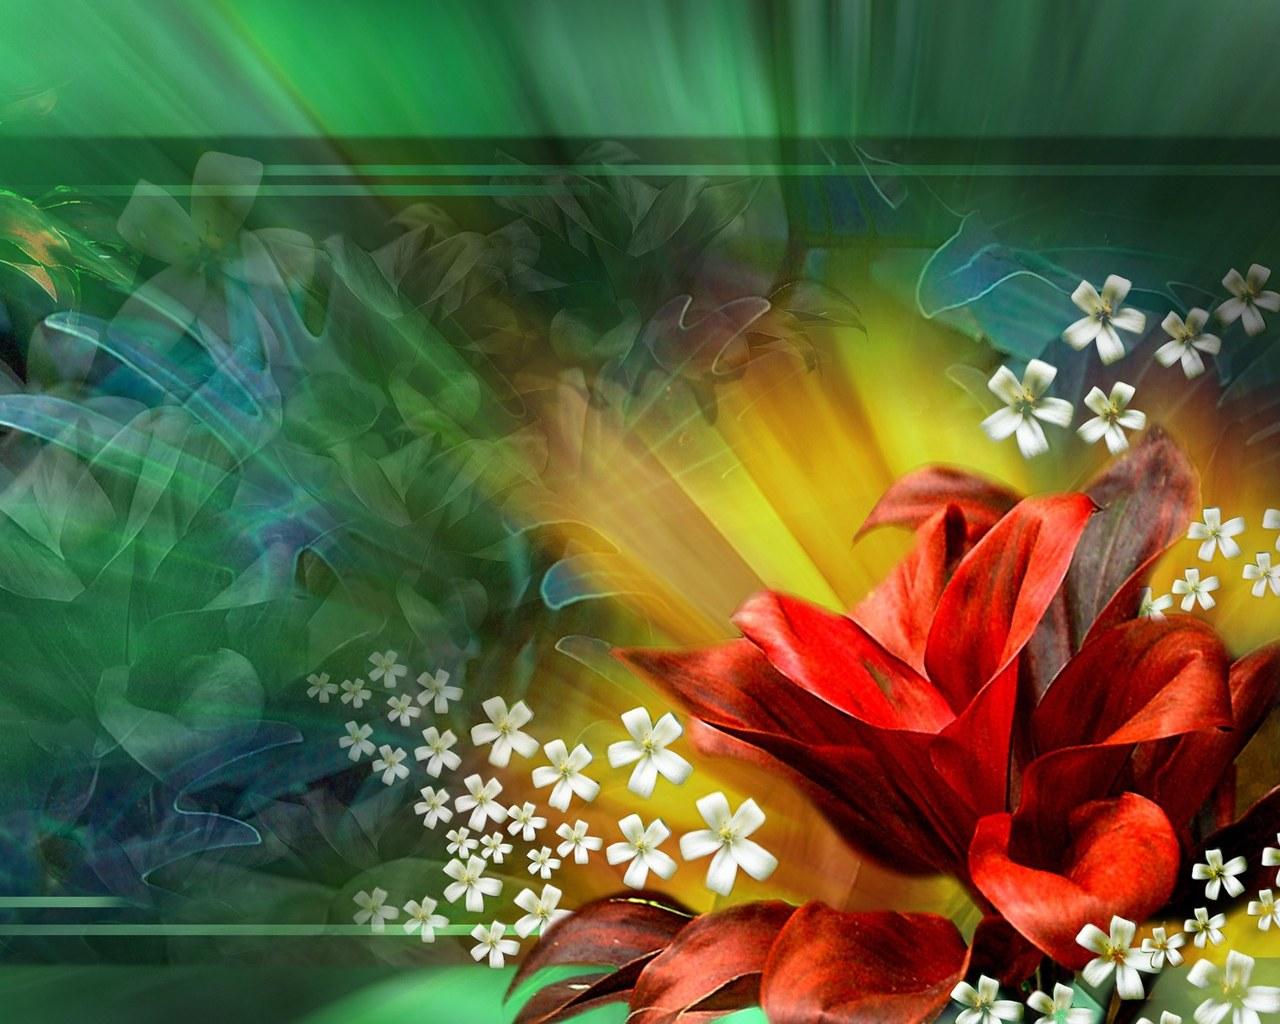 Funny Desktop Wallpapers,Cool Desktop Backgrounds,Cool Wallpaper,Coolbuddy Wallpapers